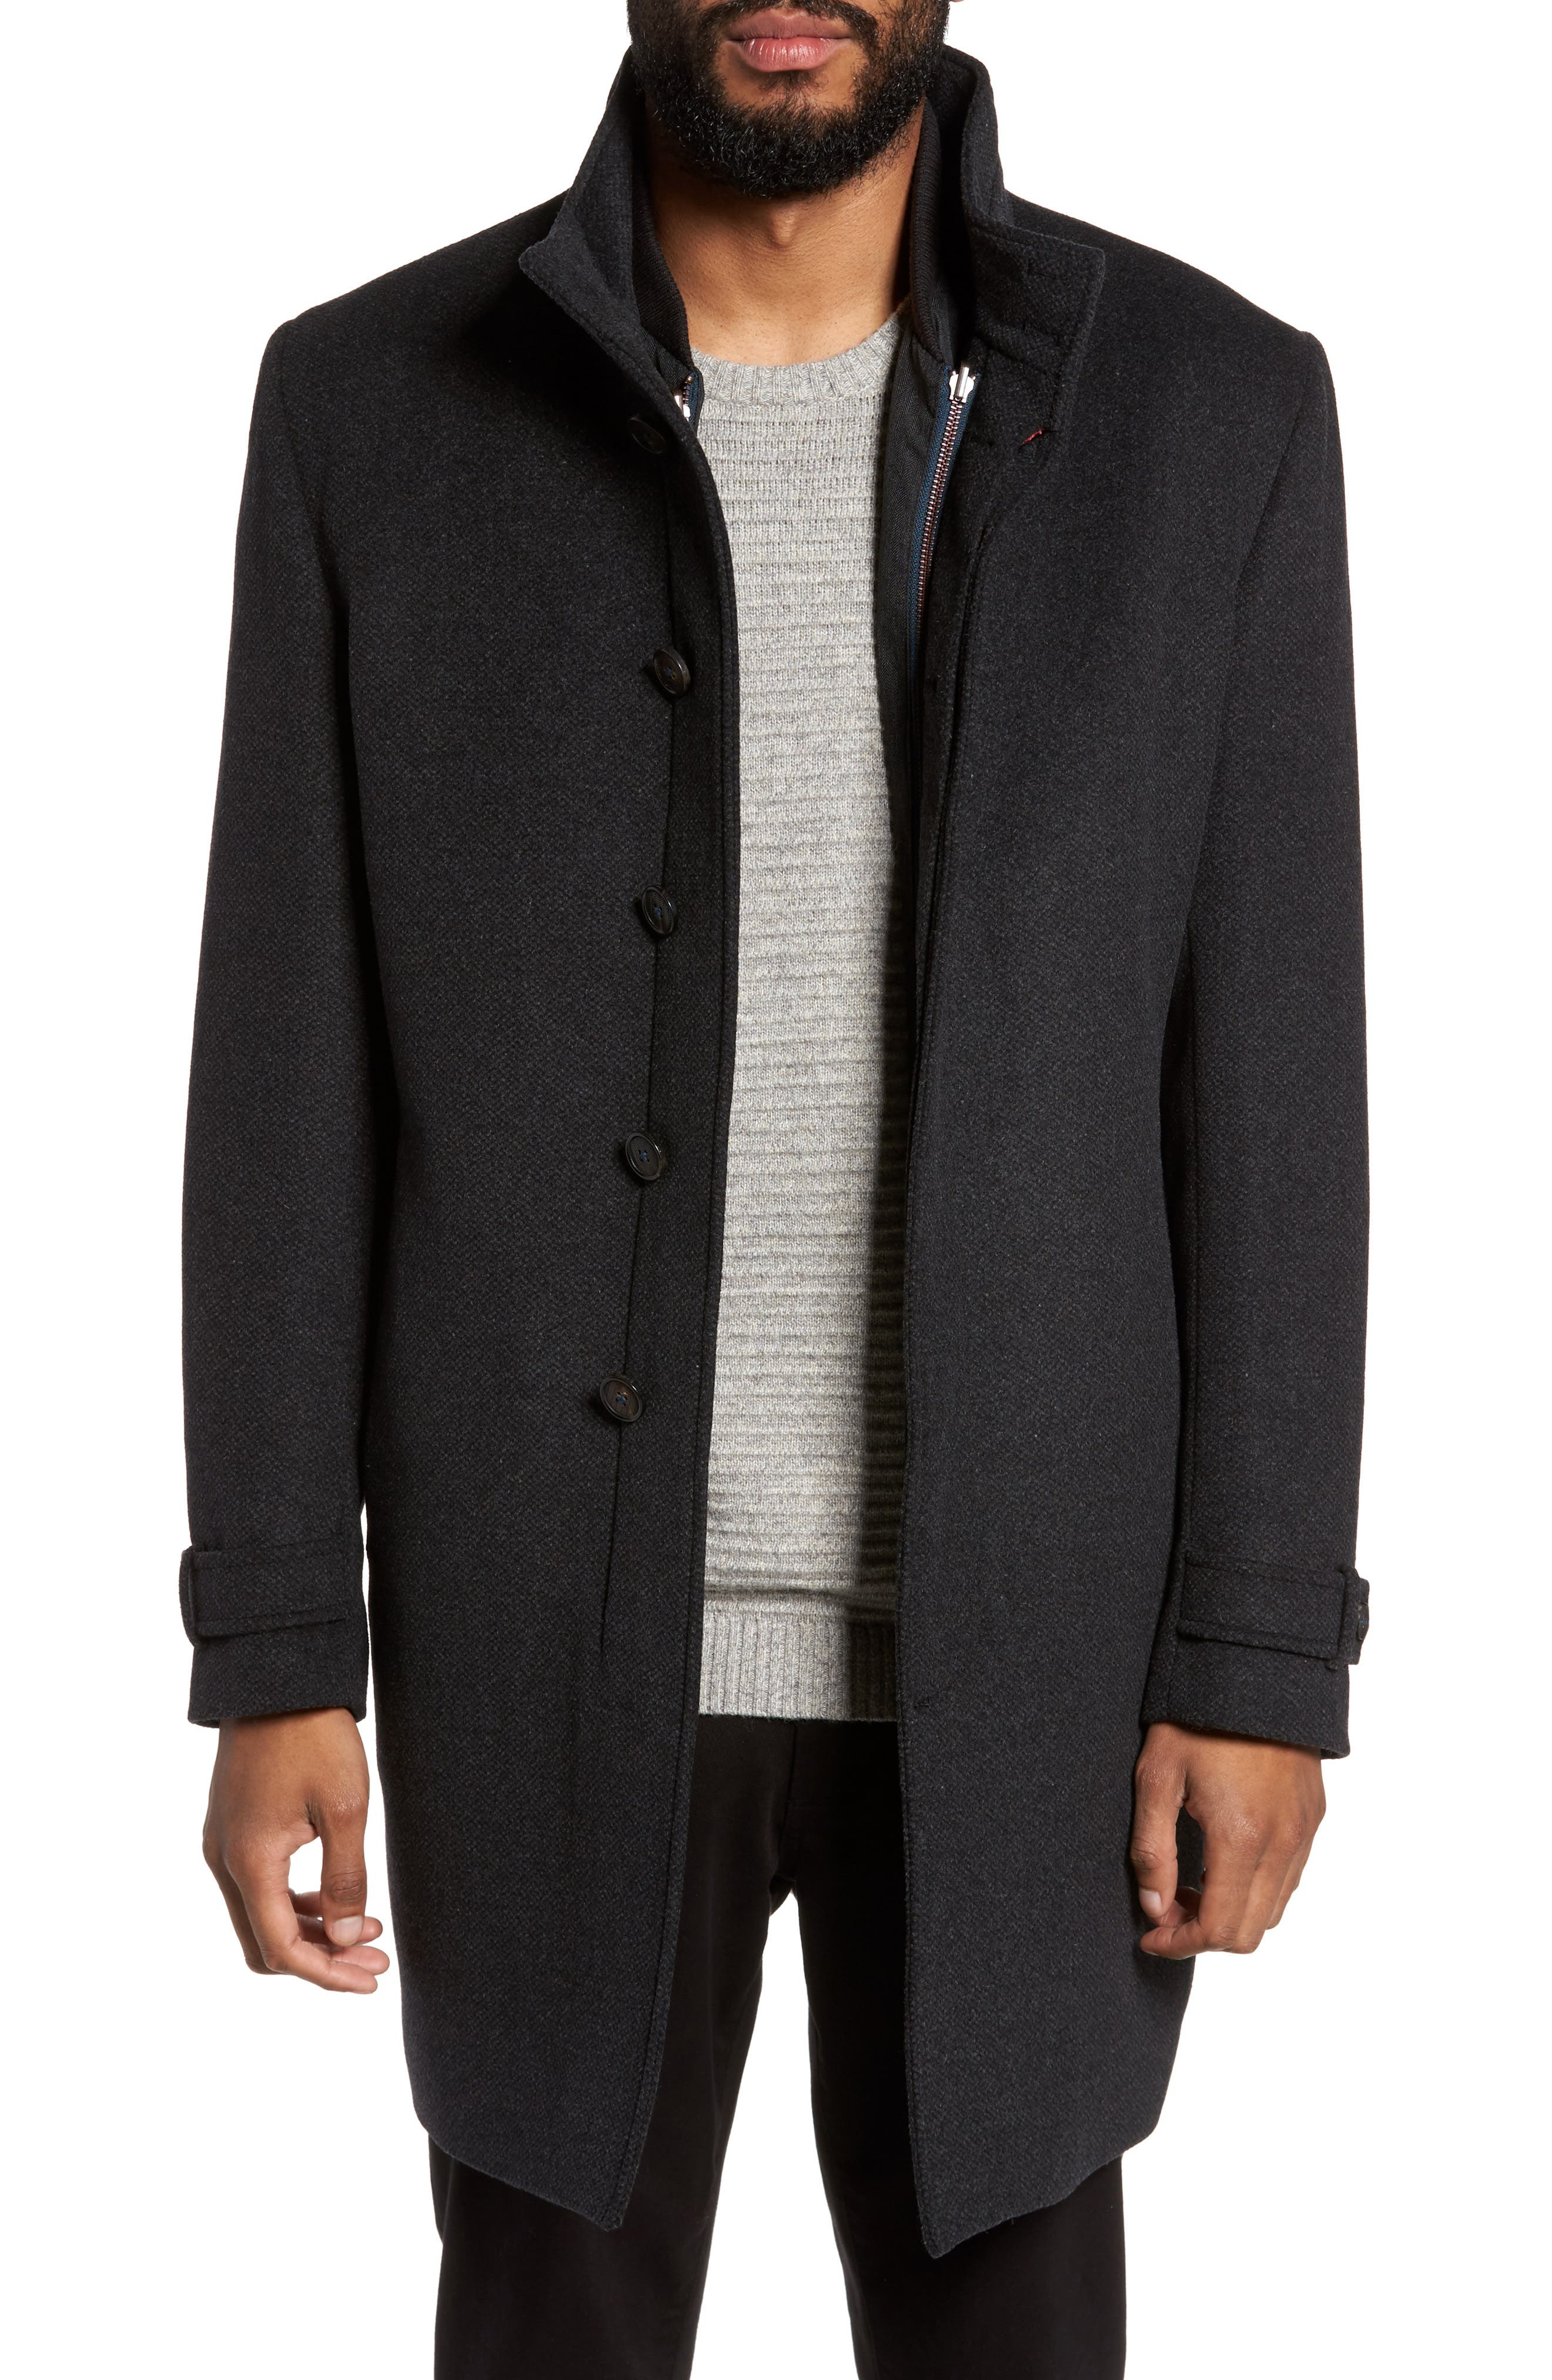 Endurance Overcoat,                         Main,                         color, 010